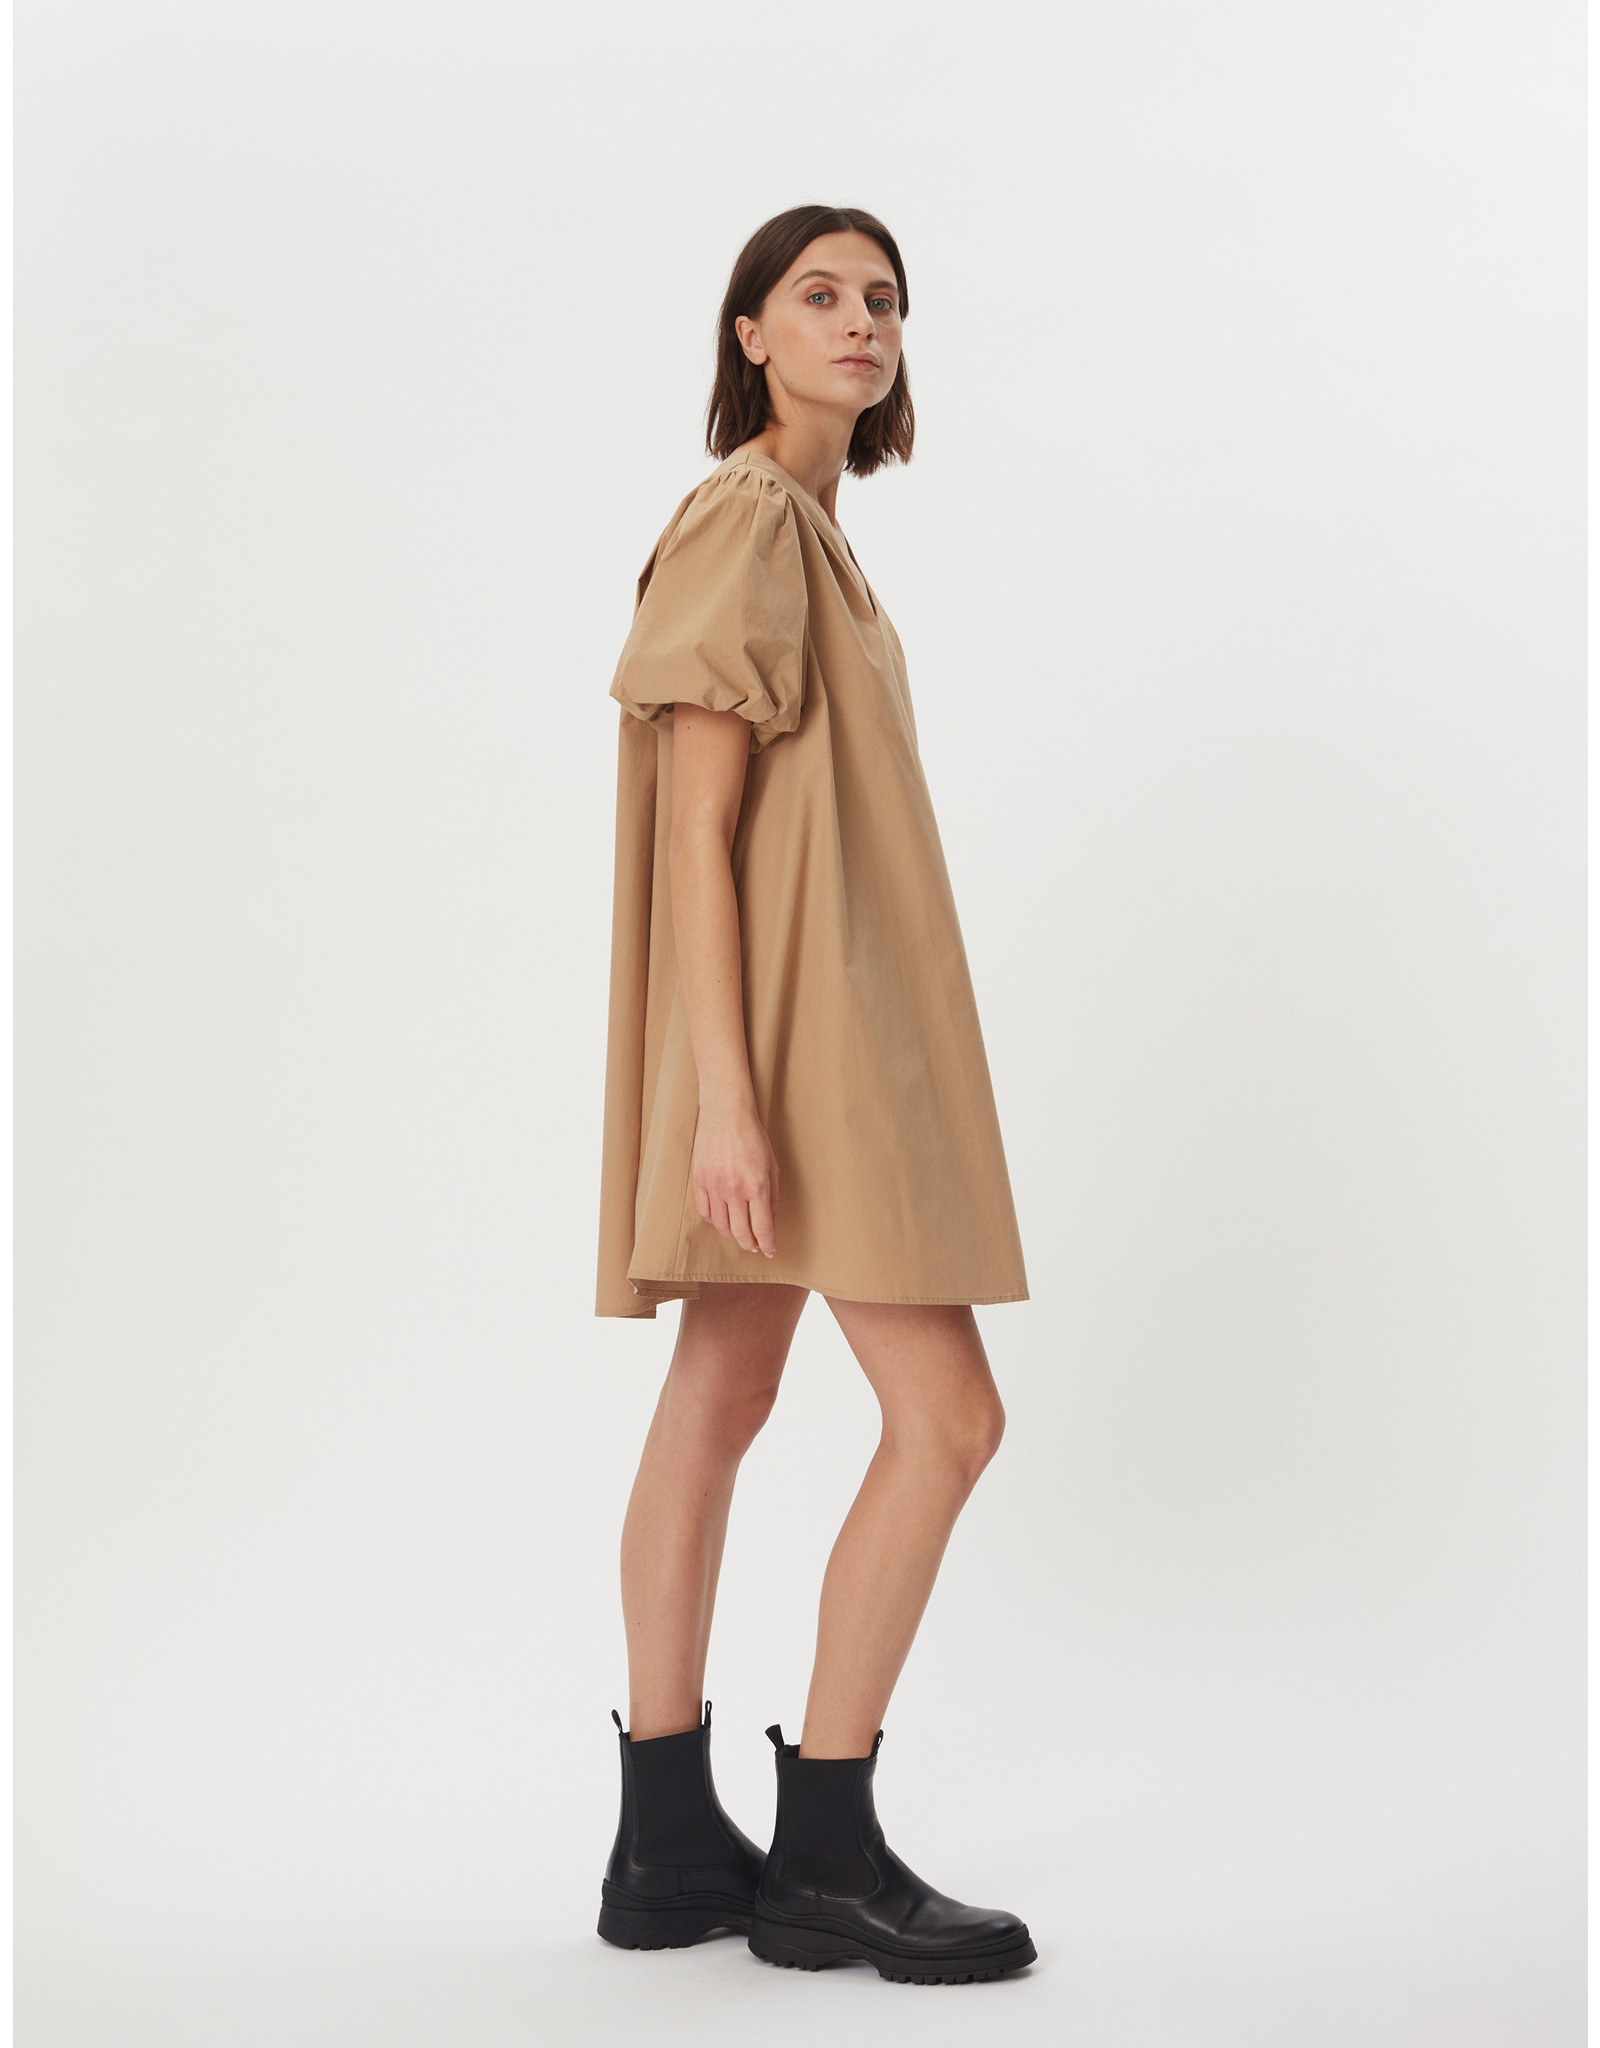 POPELIN DRESS CAMEL